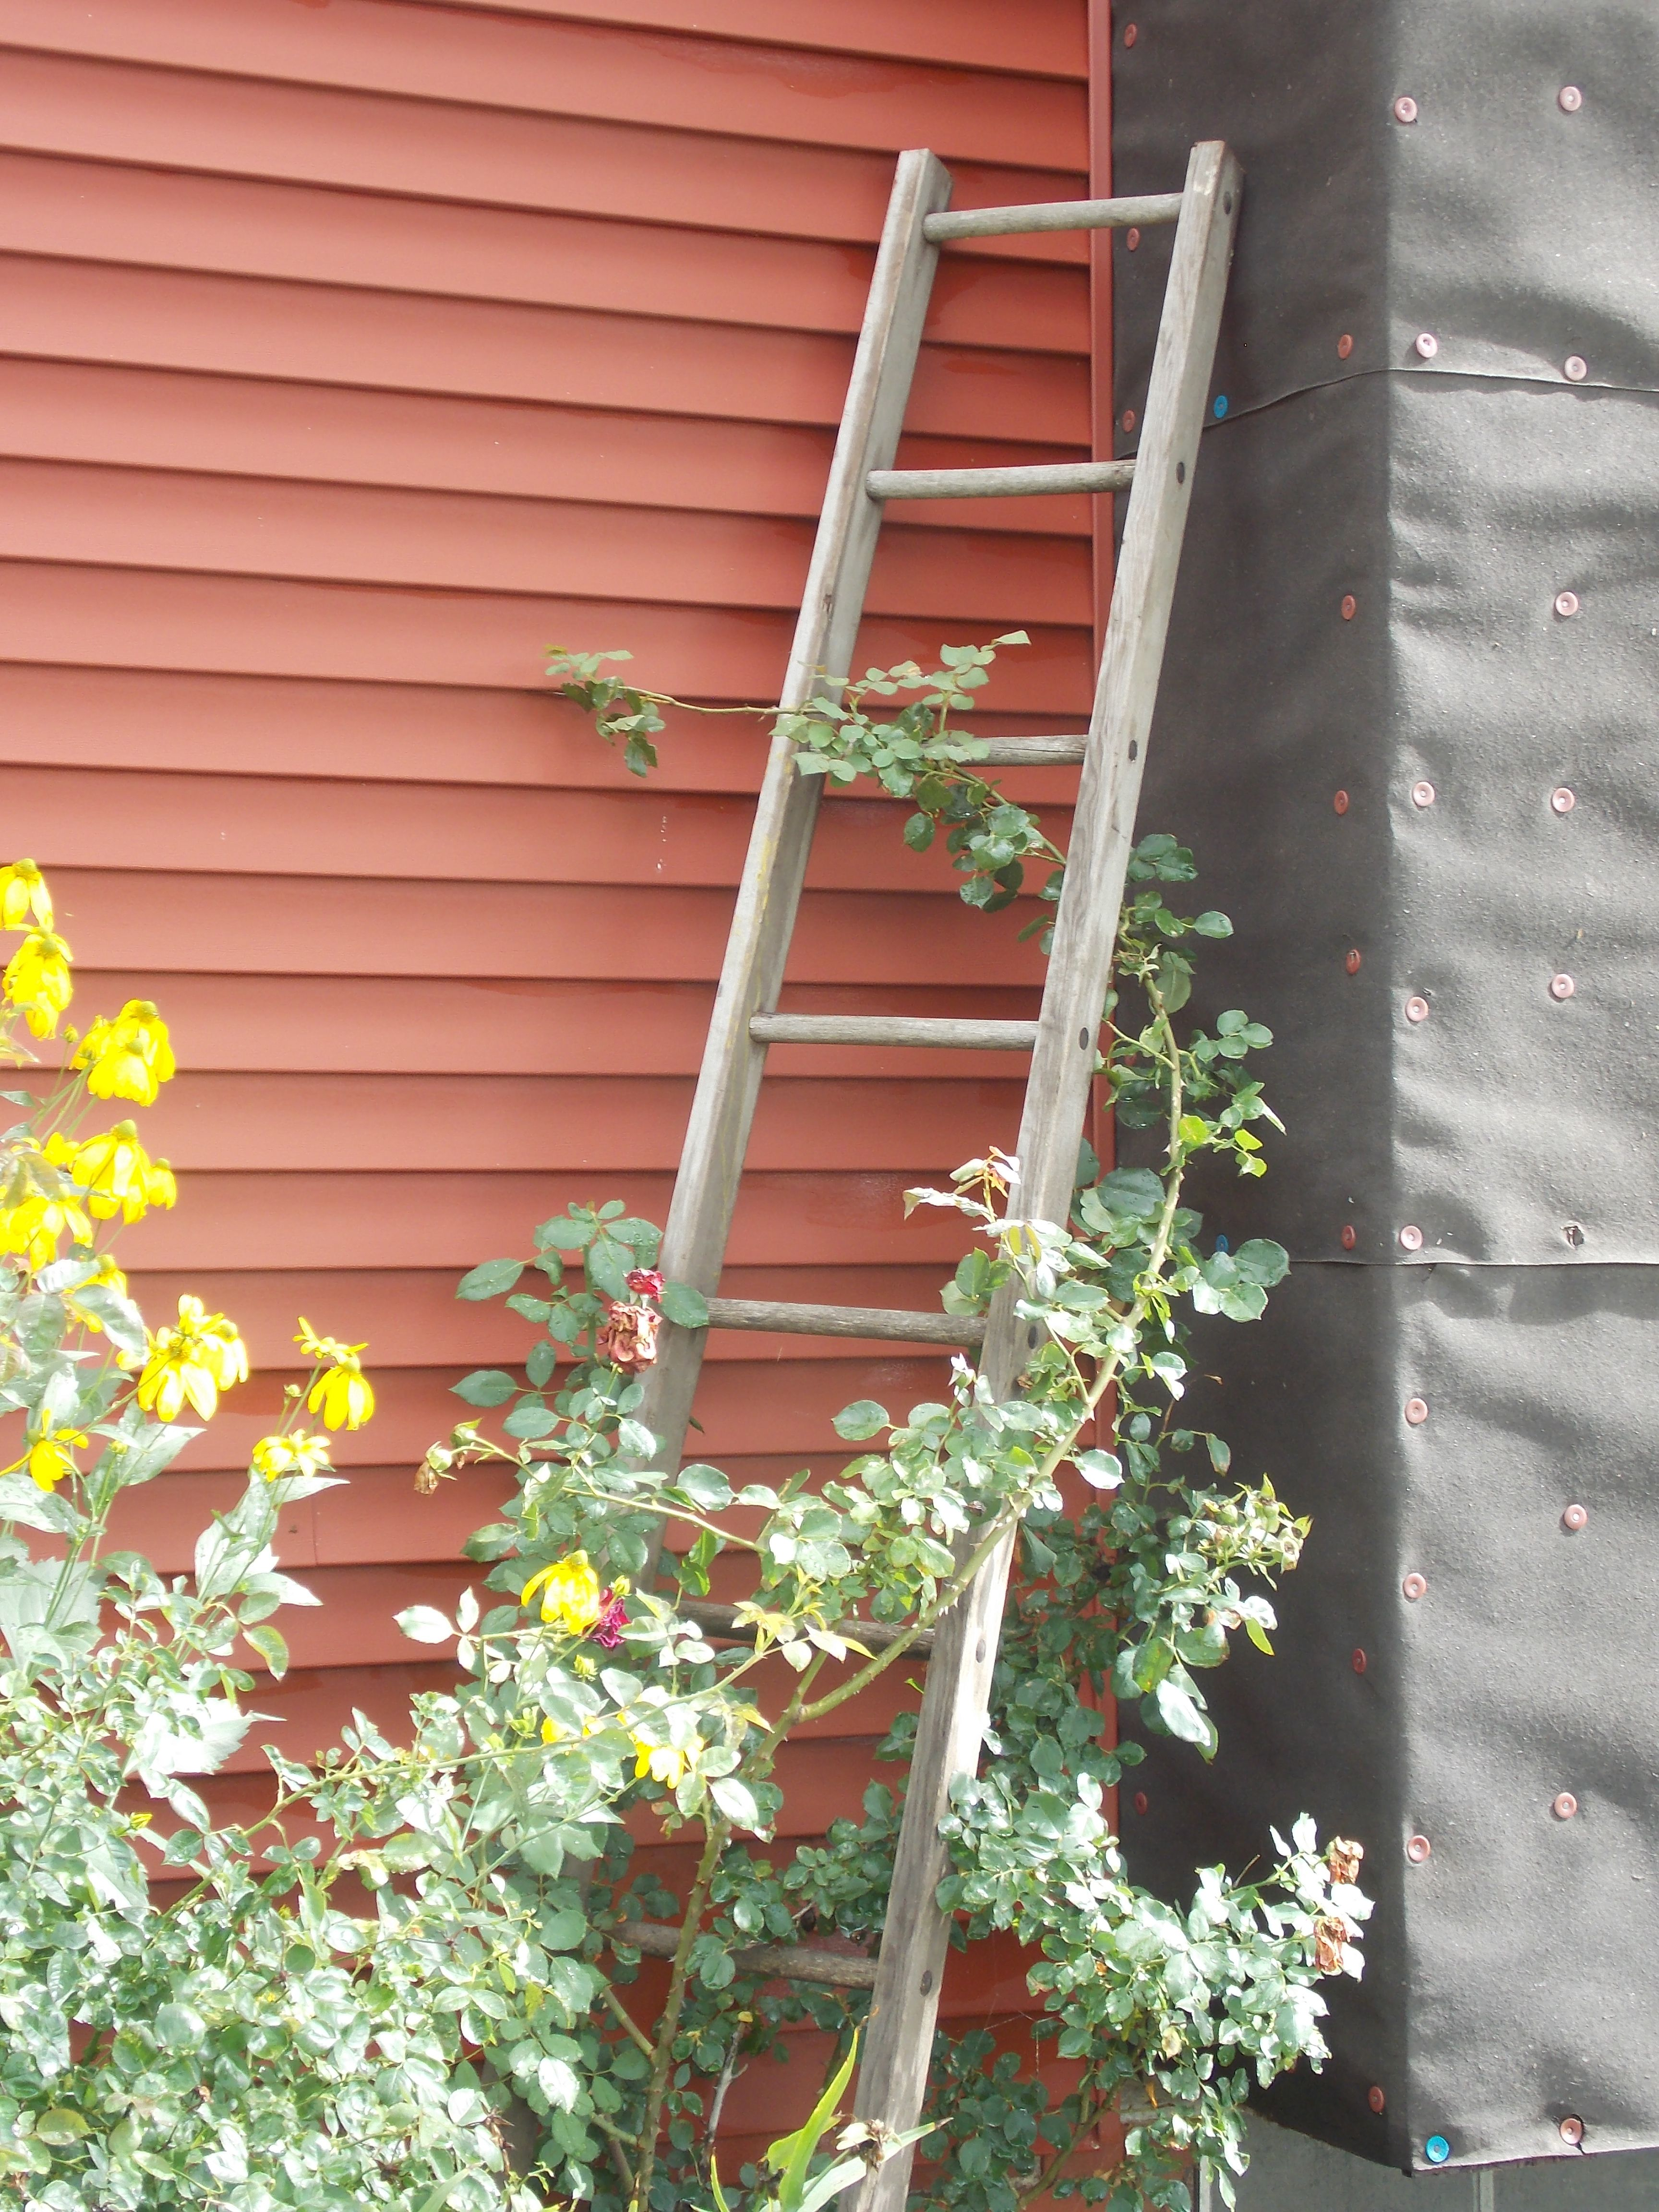 Ladder trellis for climbing rose bush old wooden ladders pintere - Climbing rose trellis ...